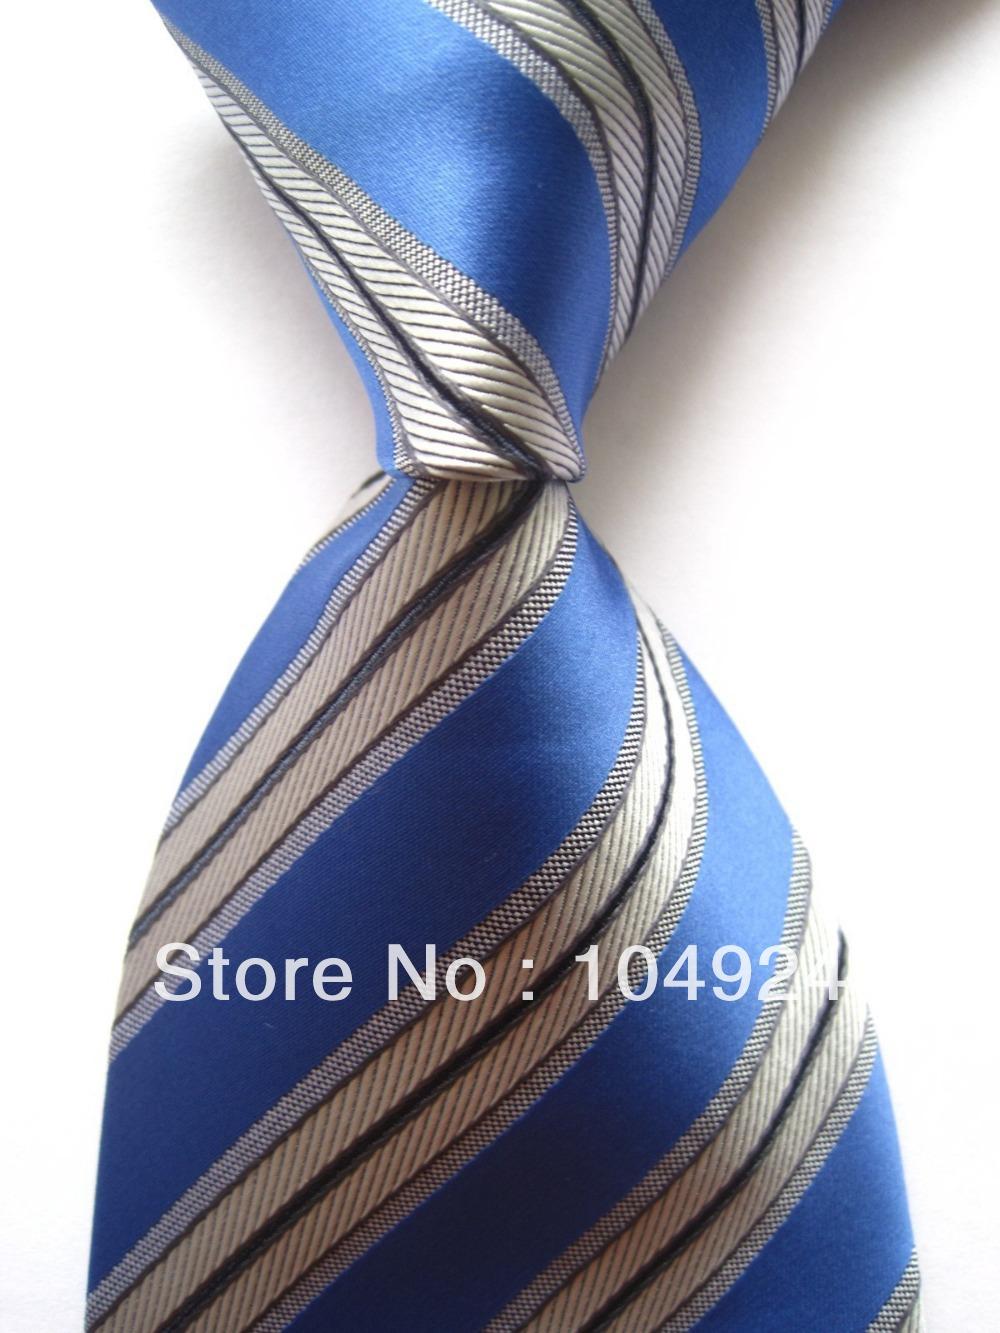 New Classic Striped Blue Black Gray JACQUARD WOVEN 100% Silk Men's Tie Necktie SN336(China (Mainland))